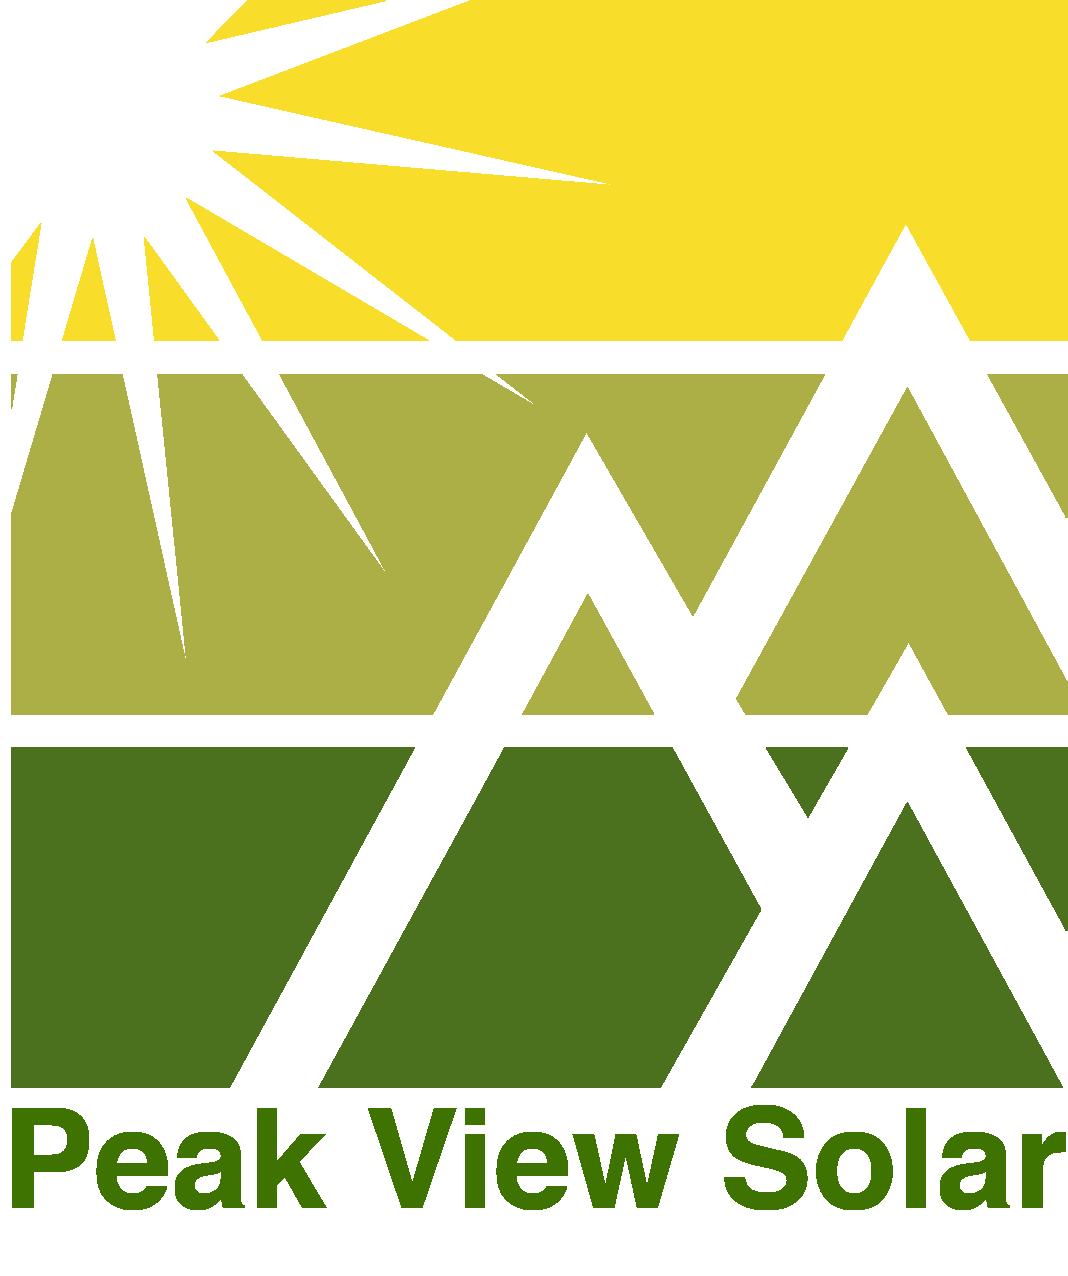 Peak View Solar logo